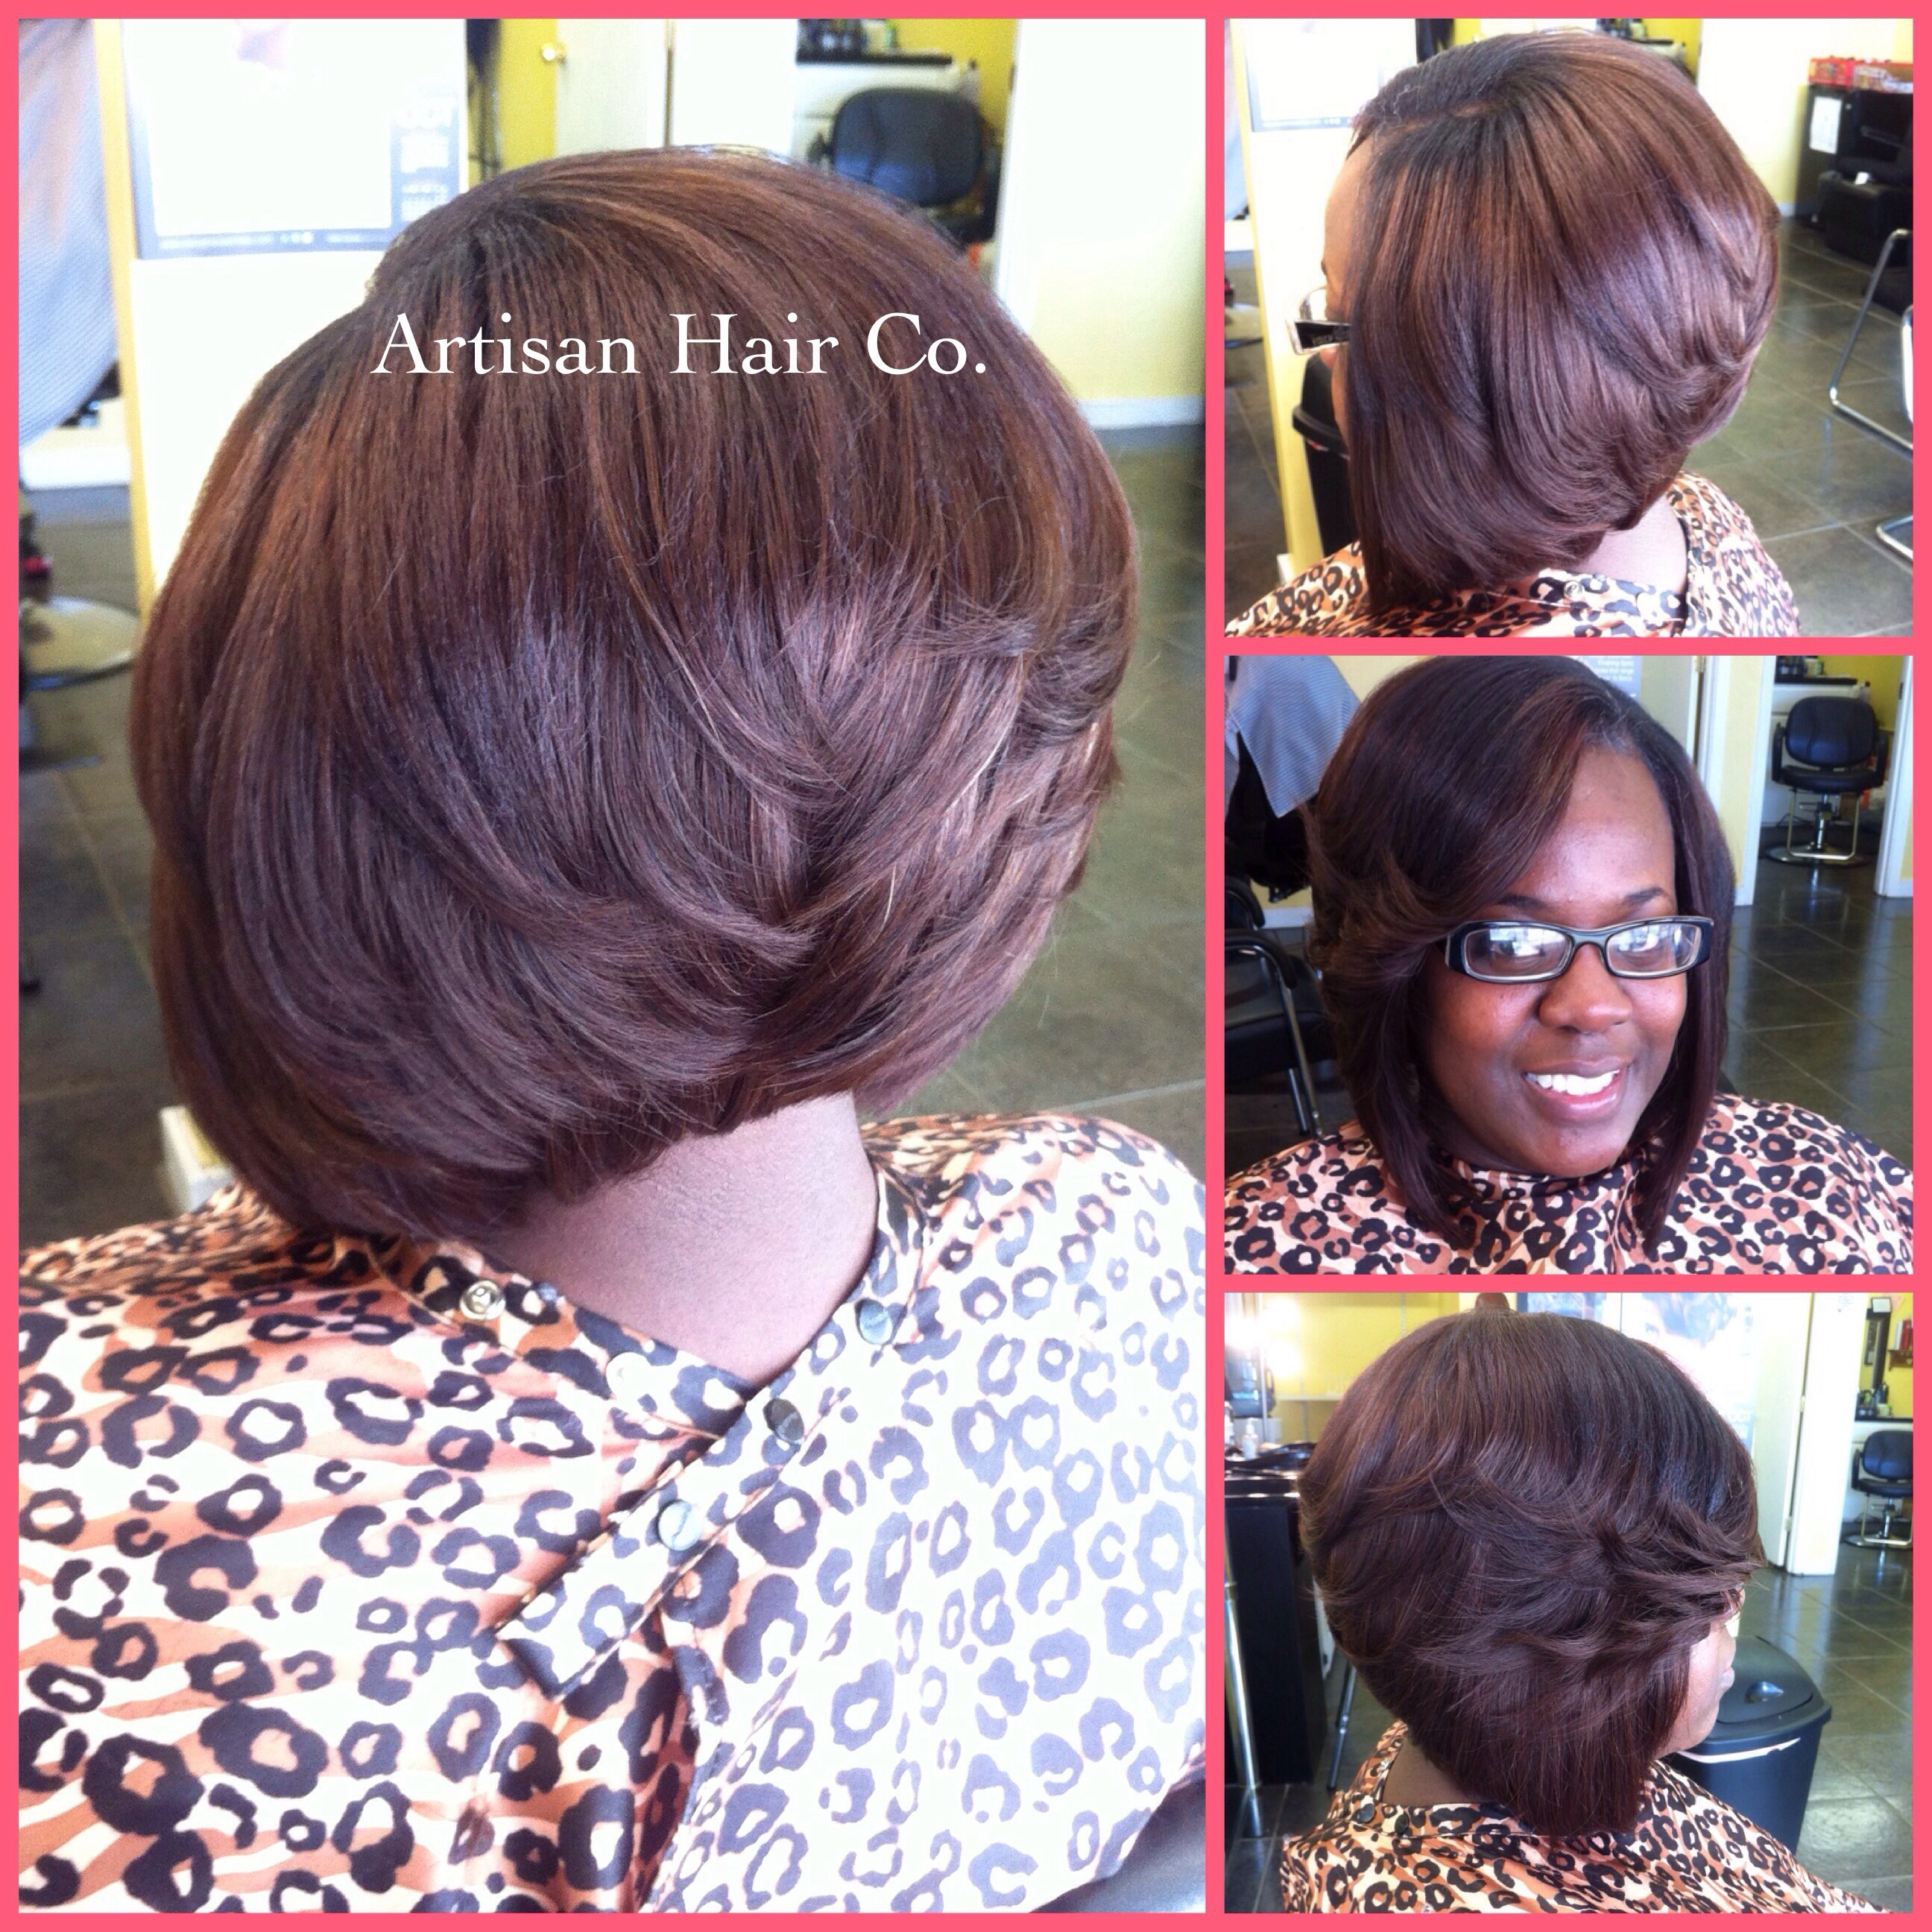 Fantastic Weave Bob Hairstyles With Side Part Photosgratisylegal Short Hairstyles For Black Women Fulllsitofus